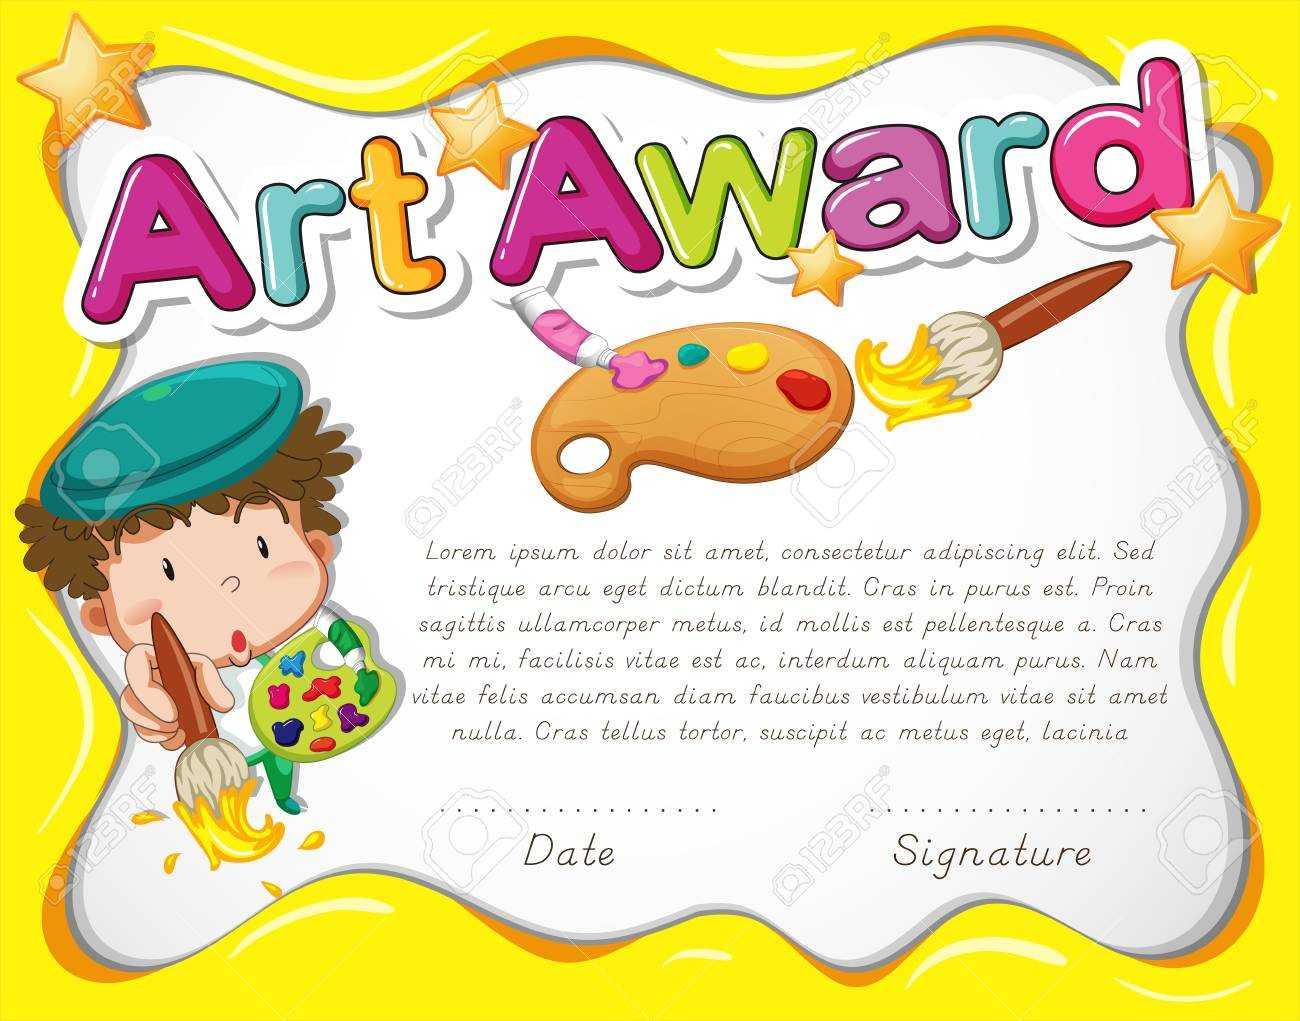 Free Art Certificate Templates - Tomope.zaribanks.co Pertaining To Free Art Certificate Templates